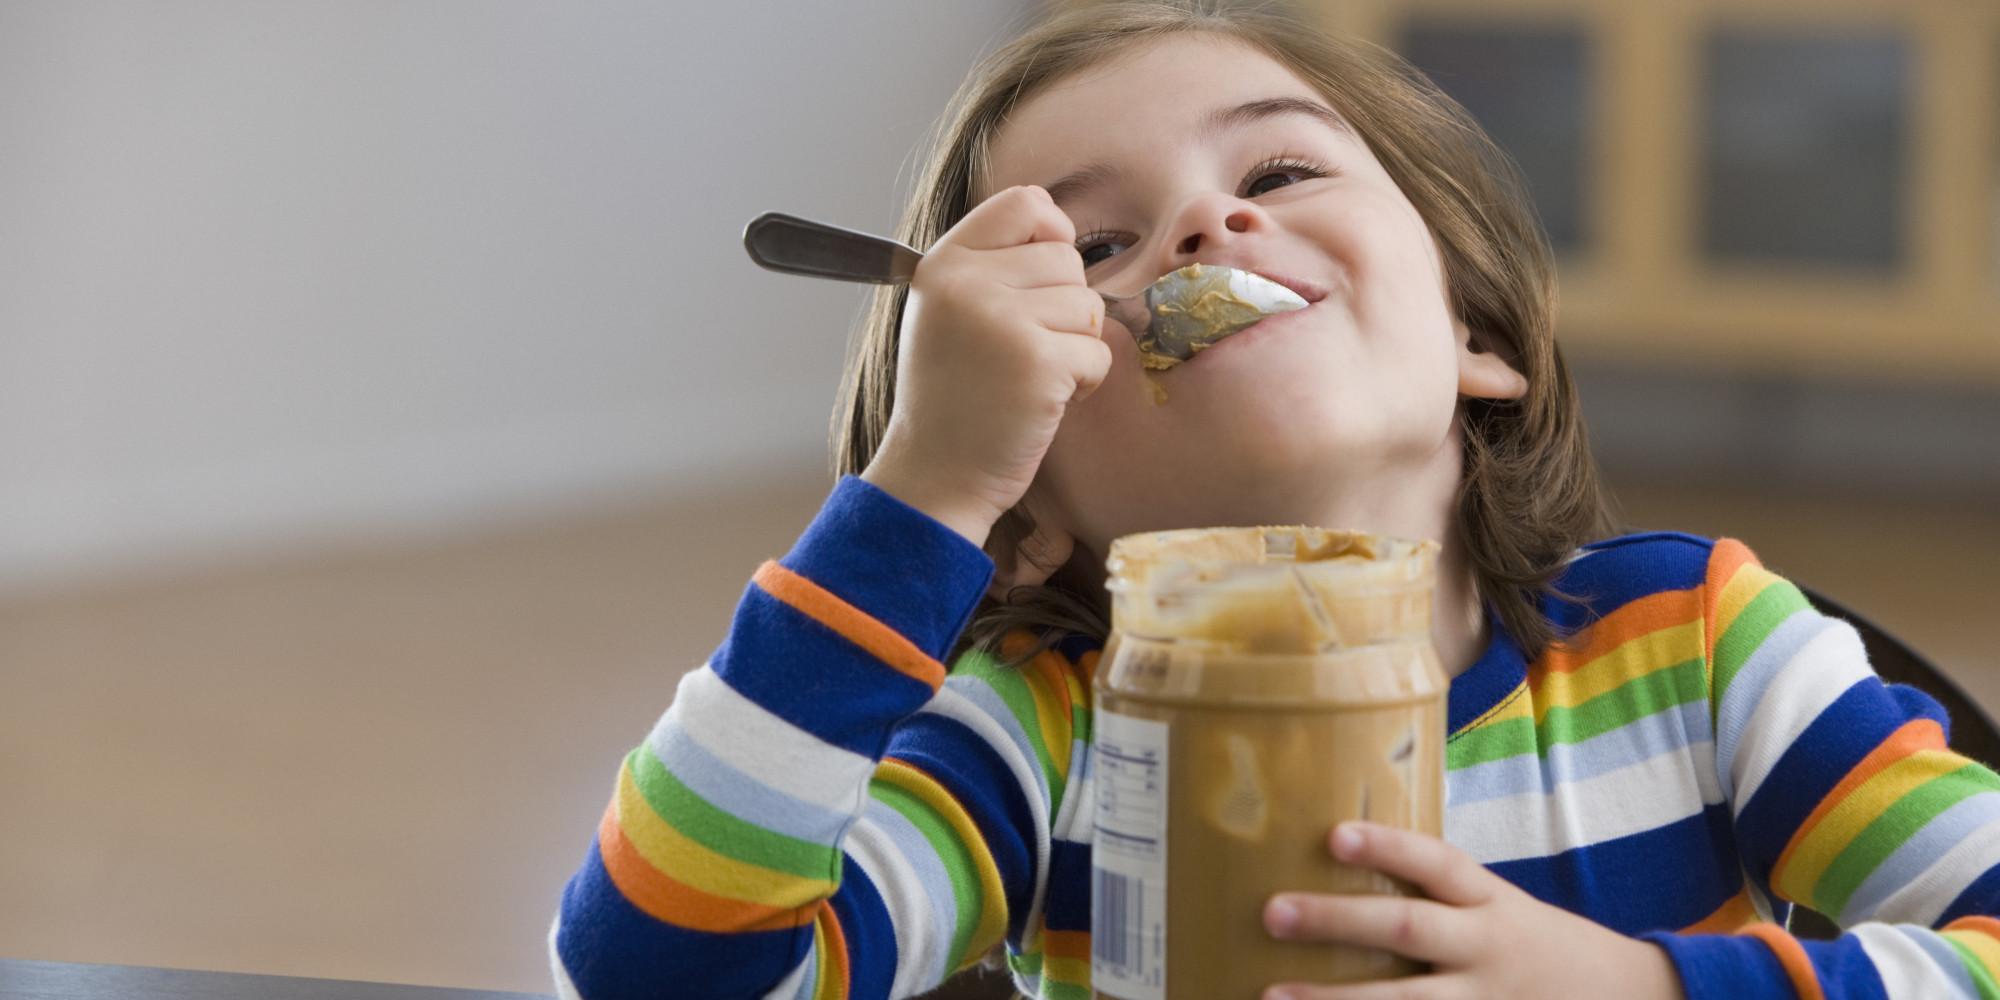 https://i1.wp.com/i.huffpost.com/gen/1435326/thumbs/o-KID-EATING-PEANUT-BUTTER-facebook.jpg